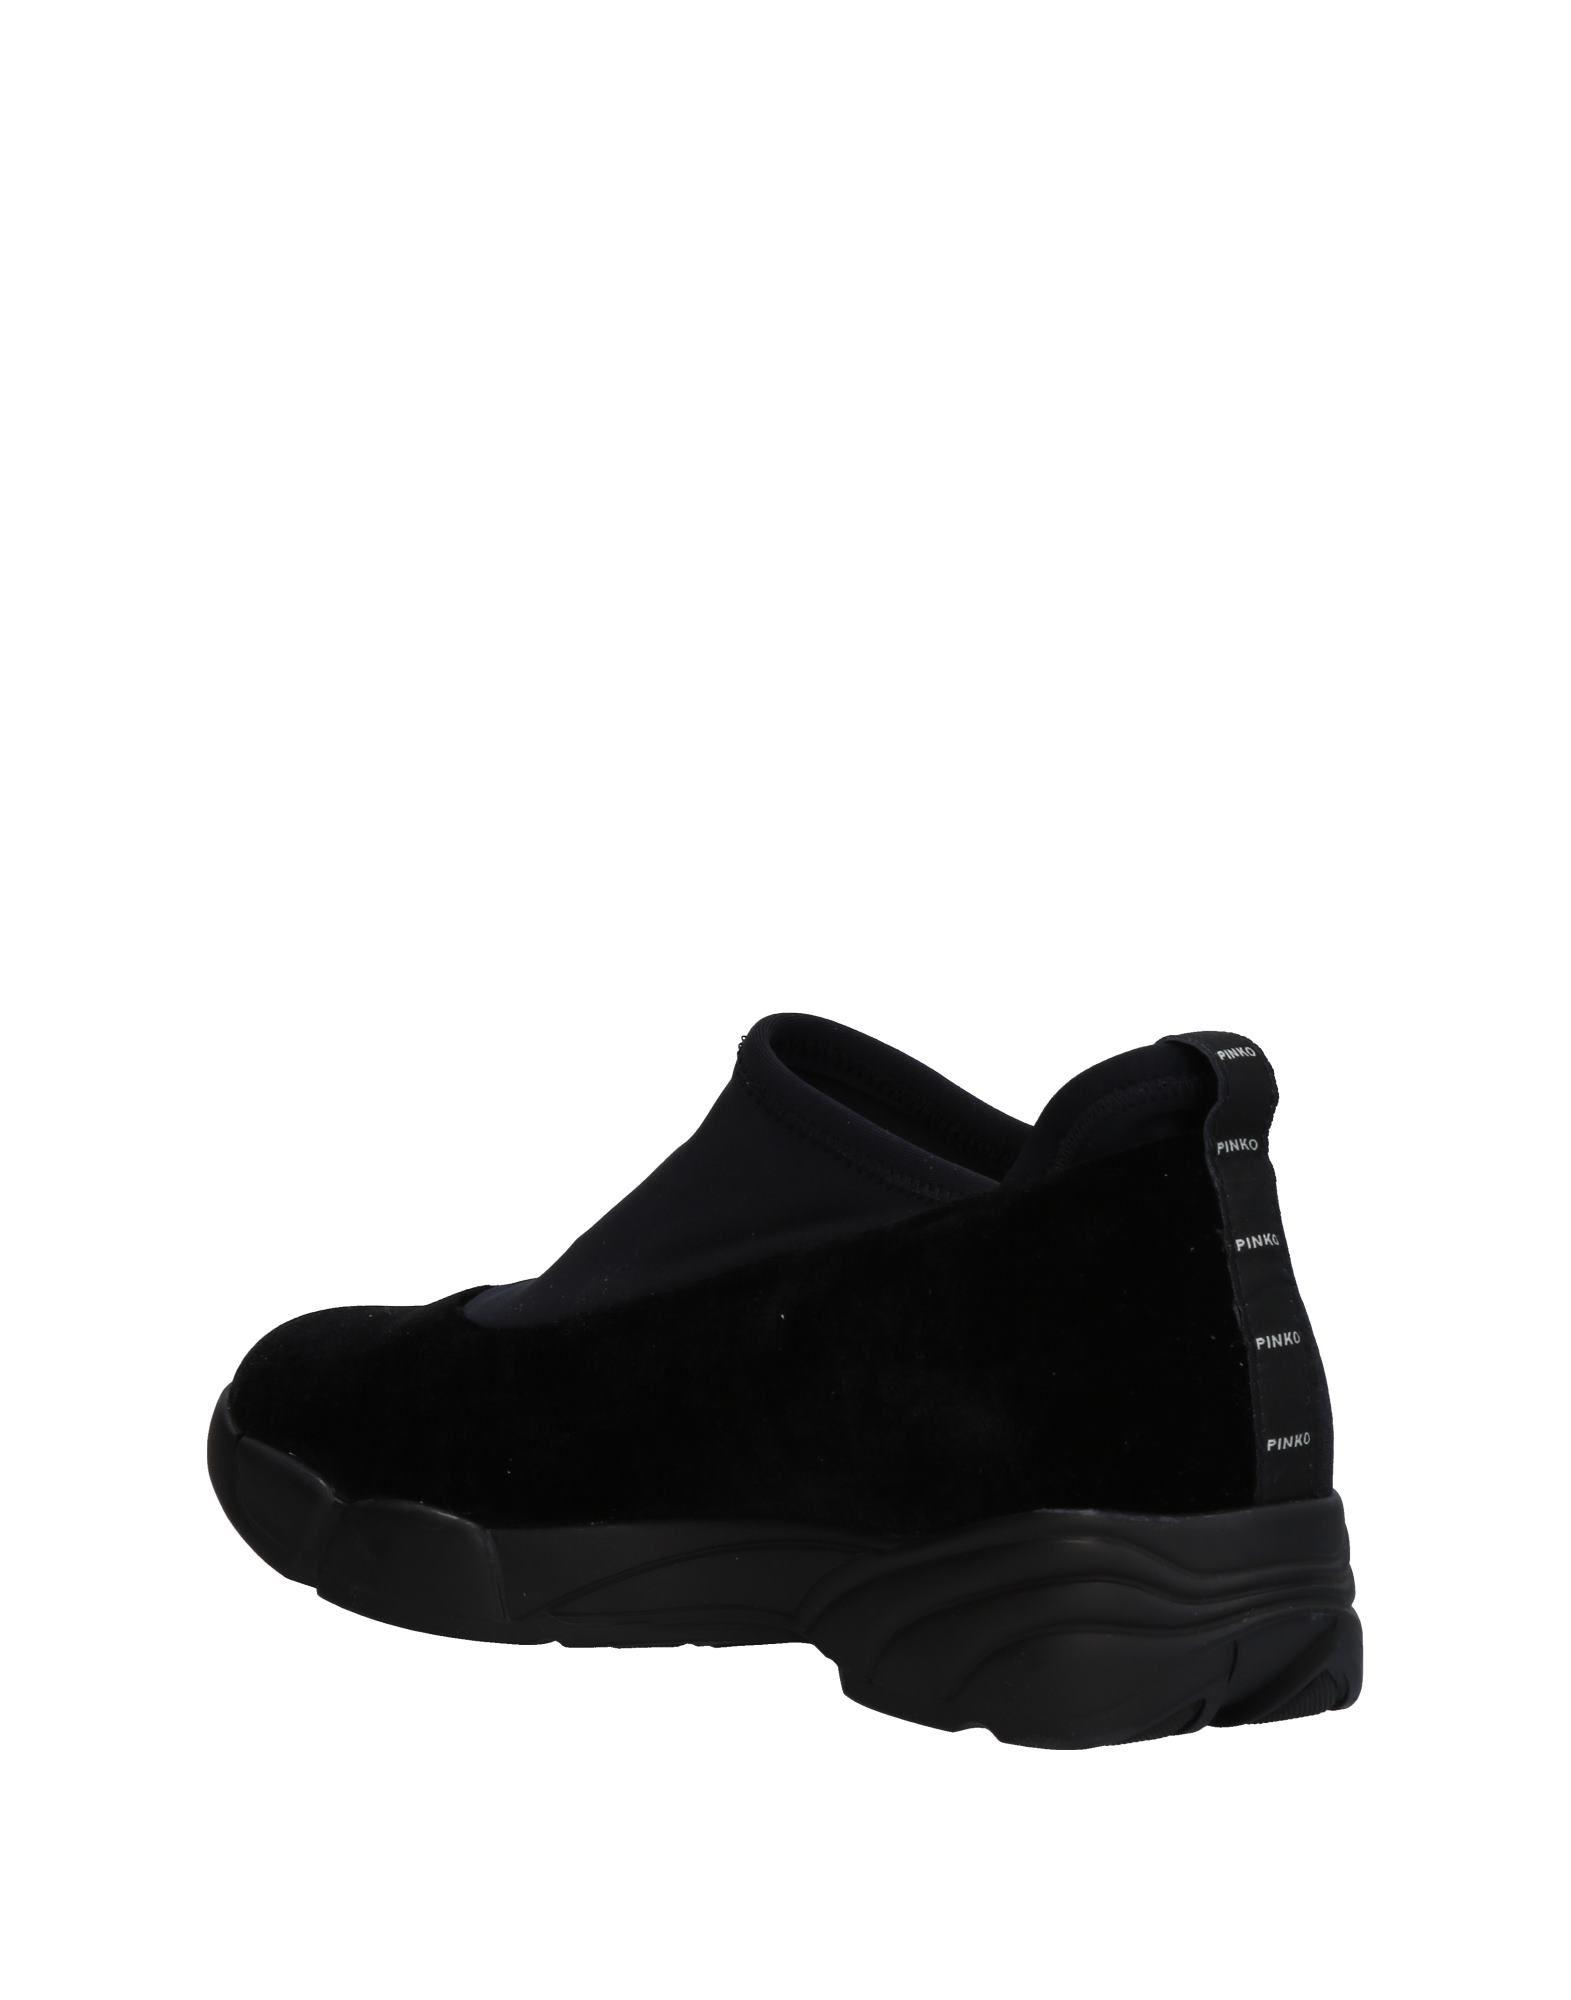 Pinko Sneakers Gute Damen  11459776FC Gute Sneakers Qualität beliebte Schuhe d7f7ef